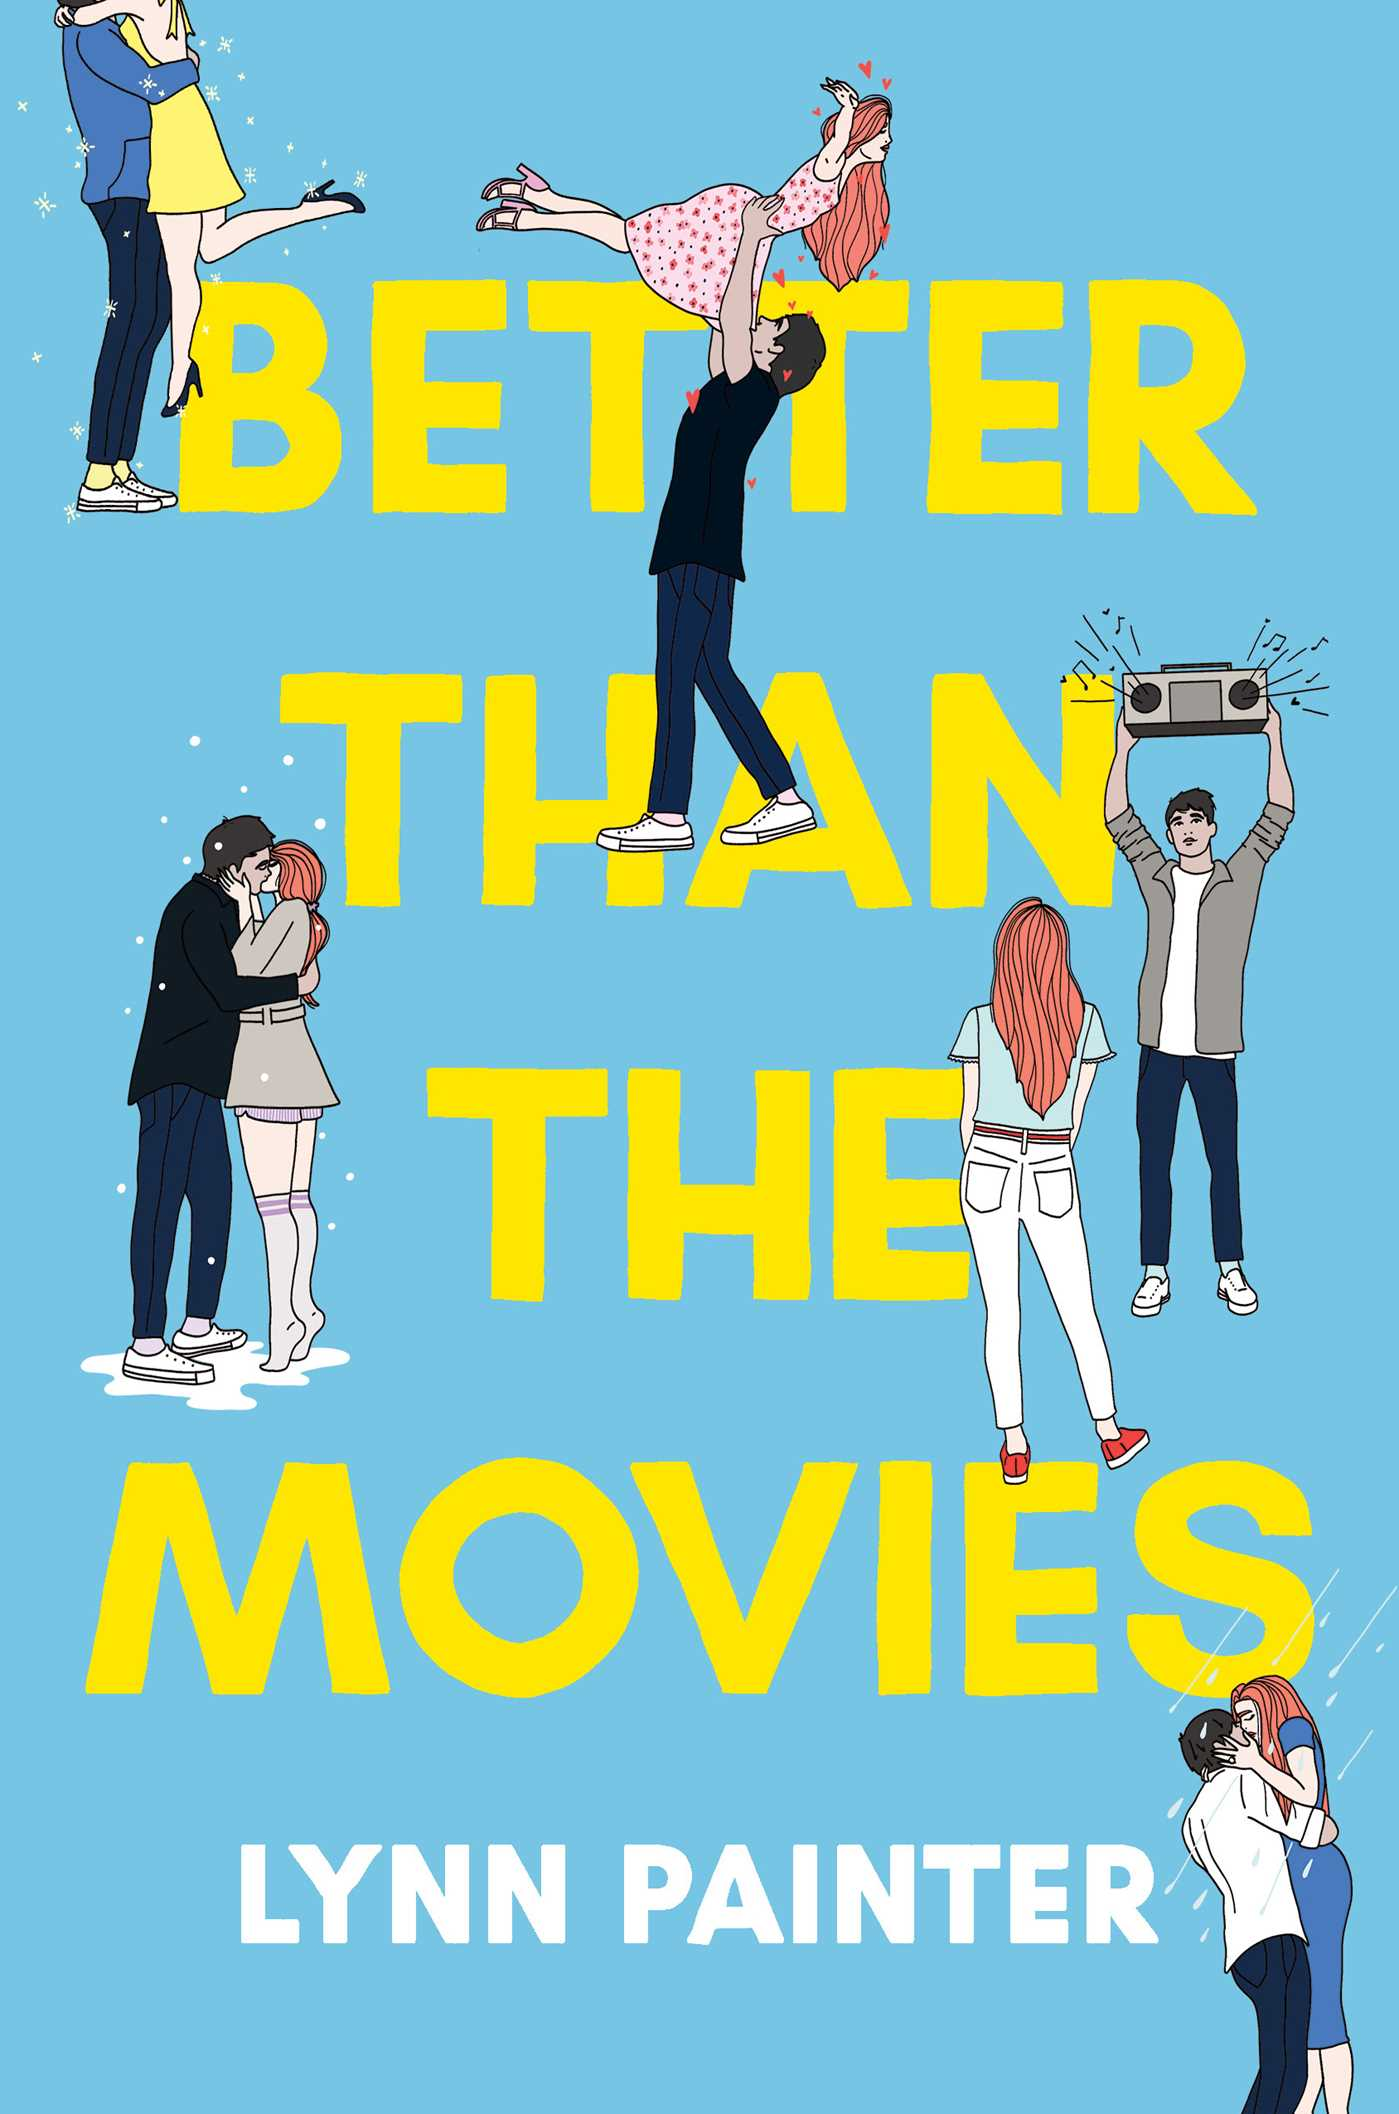 Better Than the Movies, Blue, Yellow, Boy, Girl, Romance, Pranks, Funny, Lynn Painter